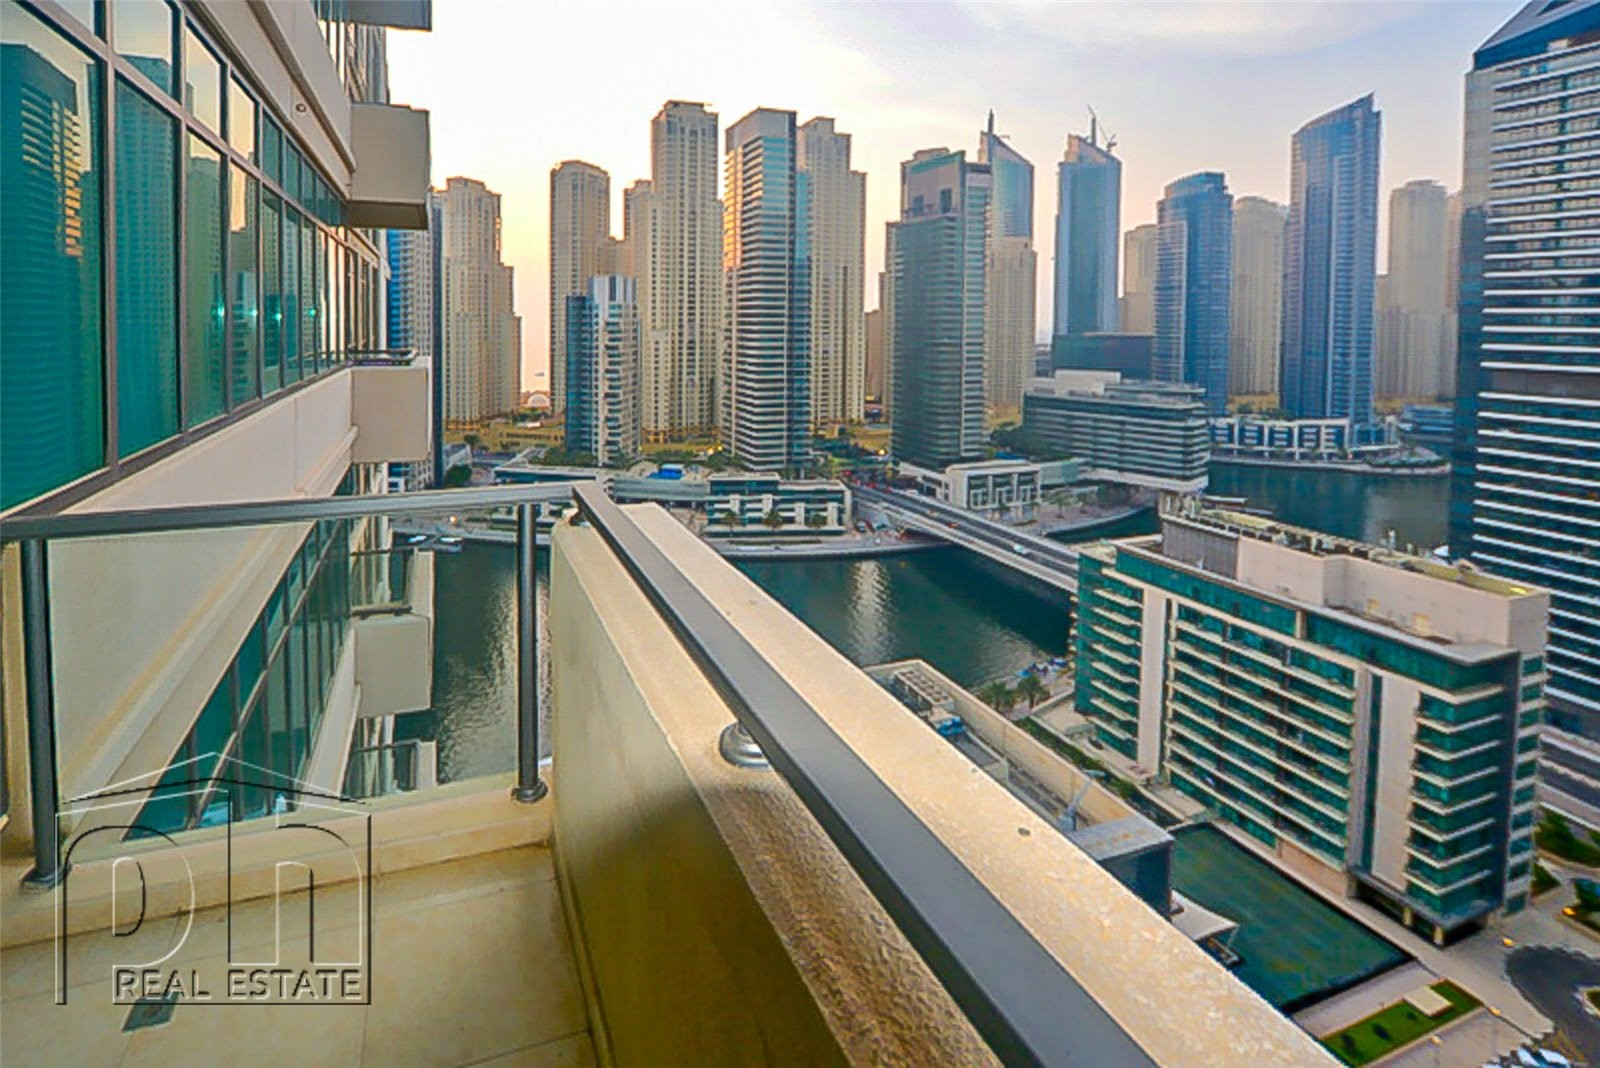 1 Bed | Marina Views | High Floor | Chiller Free